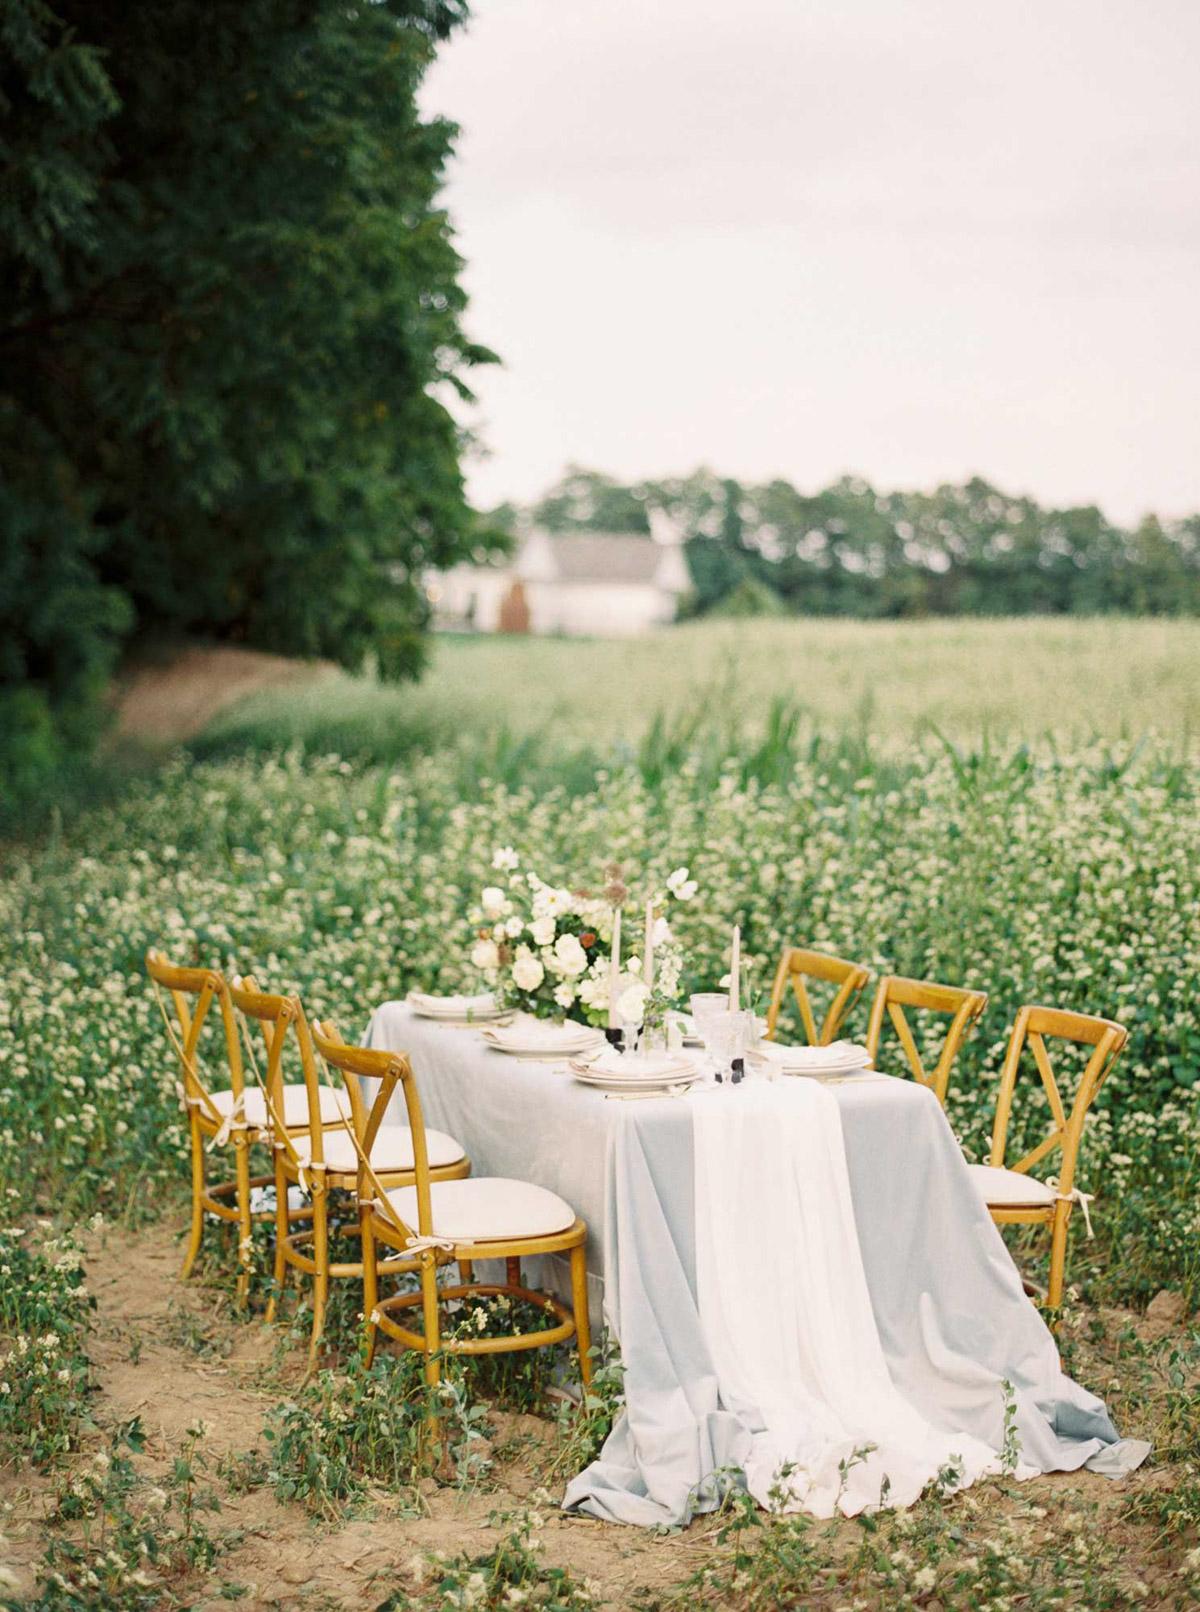 kayla-yestal-vineyard-bride-swish-list-woodland-weddings-niagara-wedding-editorial-67.jpg